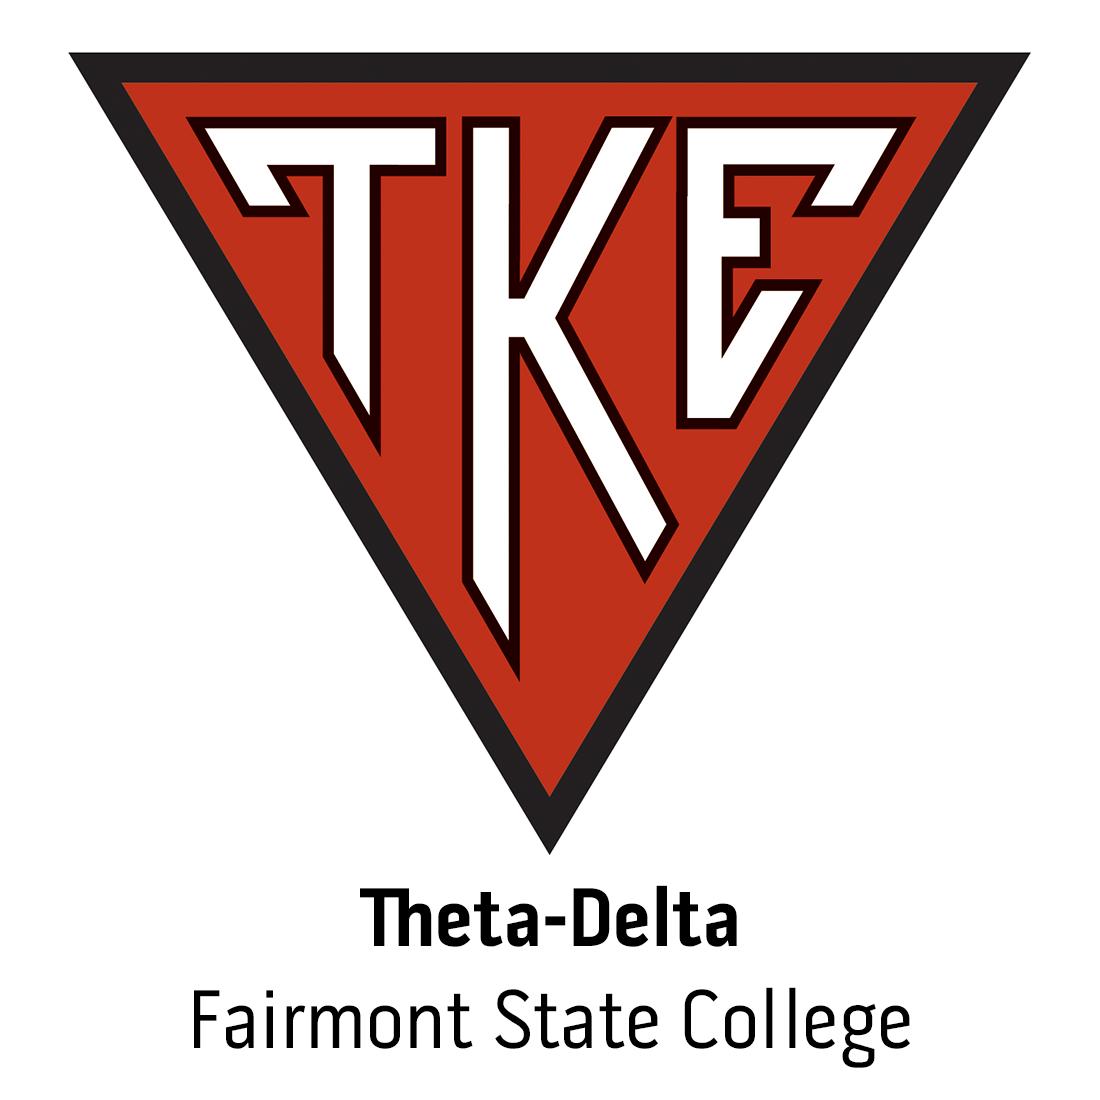 Theta-Delta Chapter at Fairmont State University